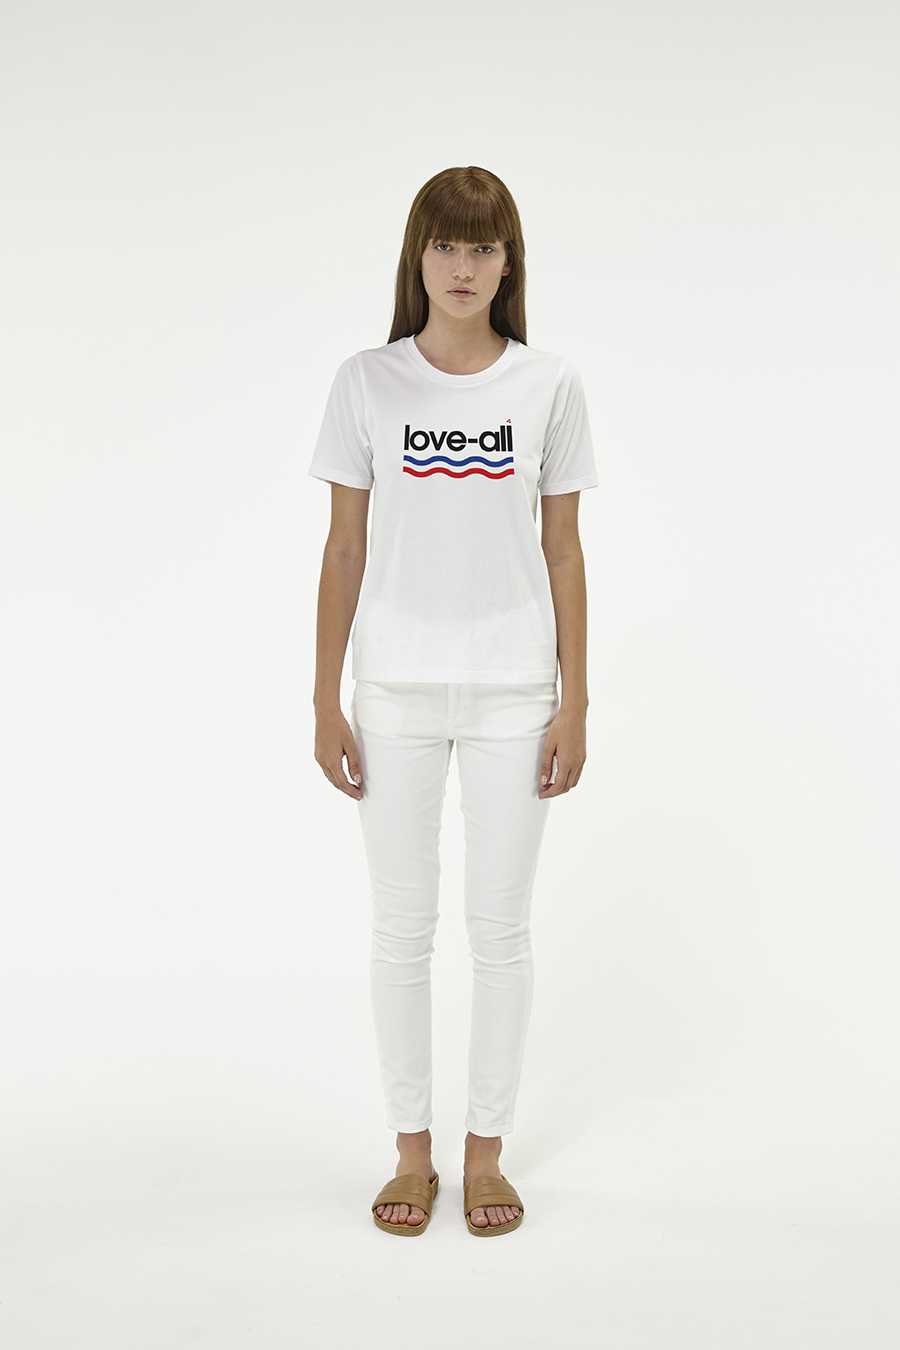 Huffer_Q3-16_W-Stella-Tee-LOVE-ALL_White-01